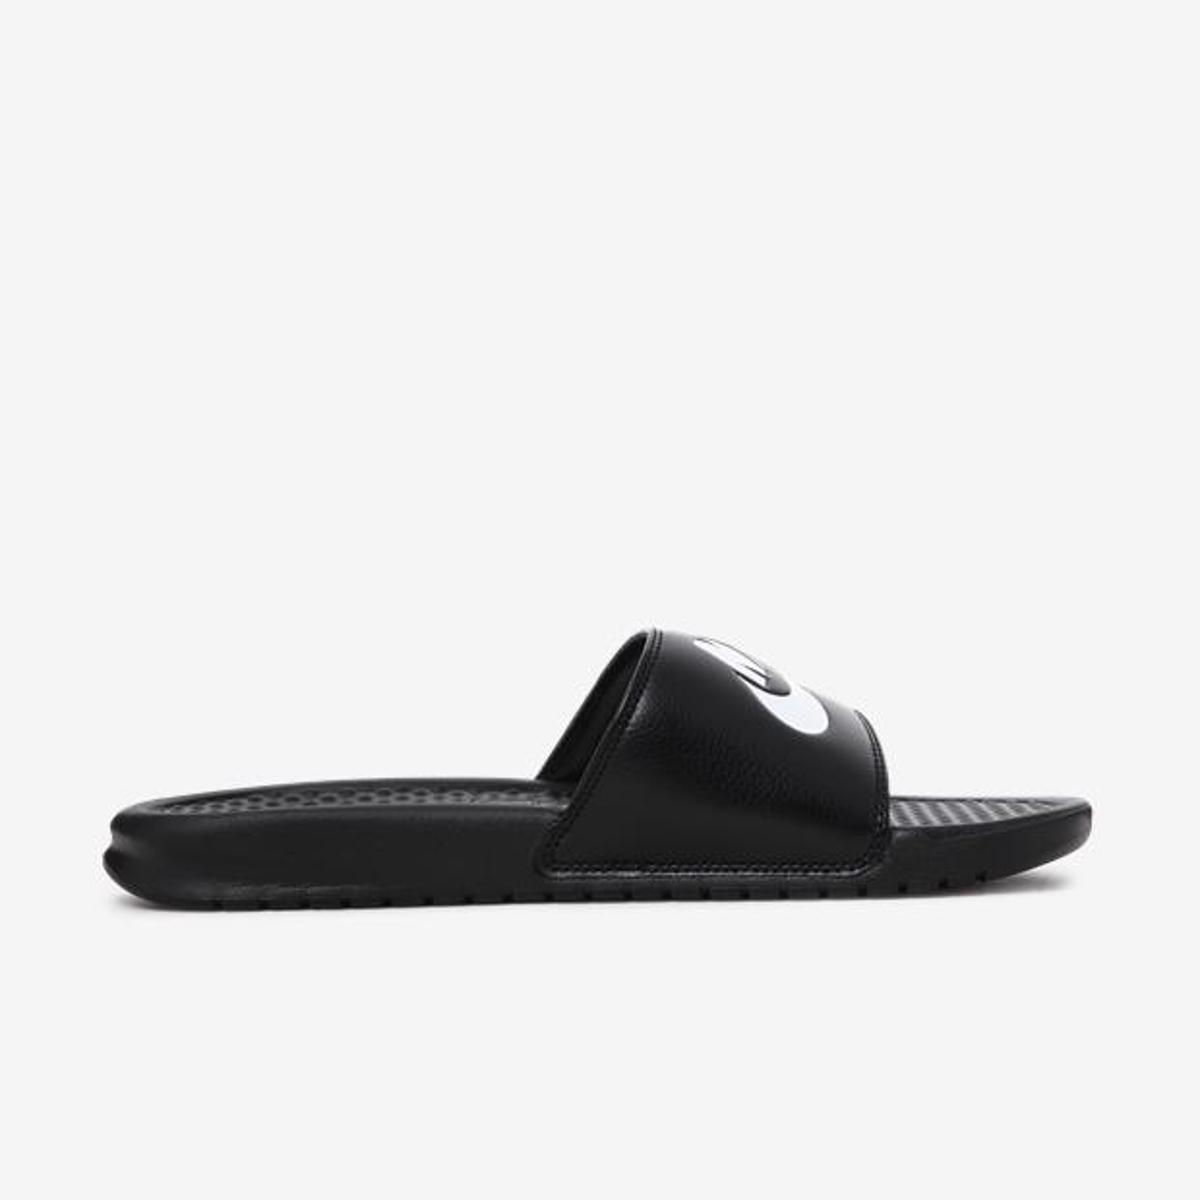 Sandália Nike Benassi JDI Masculina - Tam: 39.5 - 2